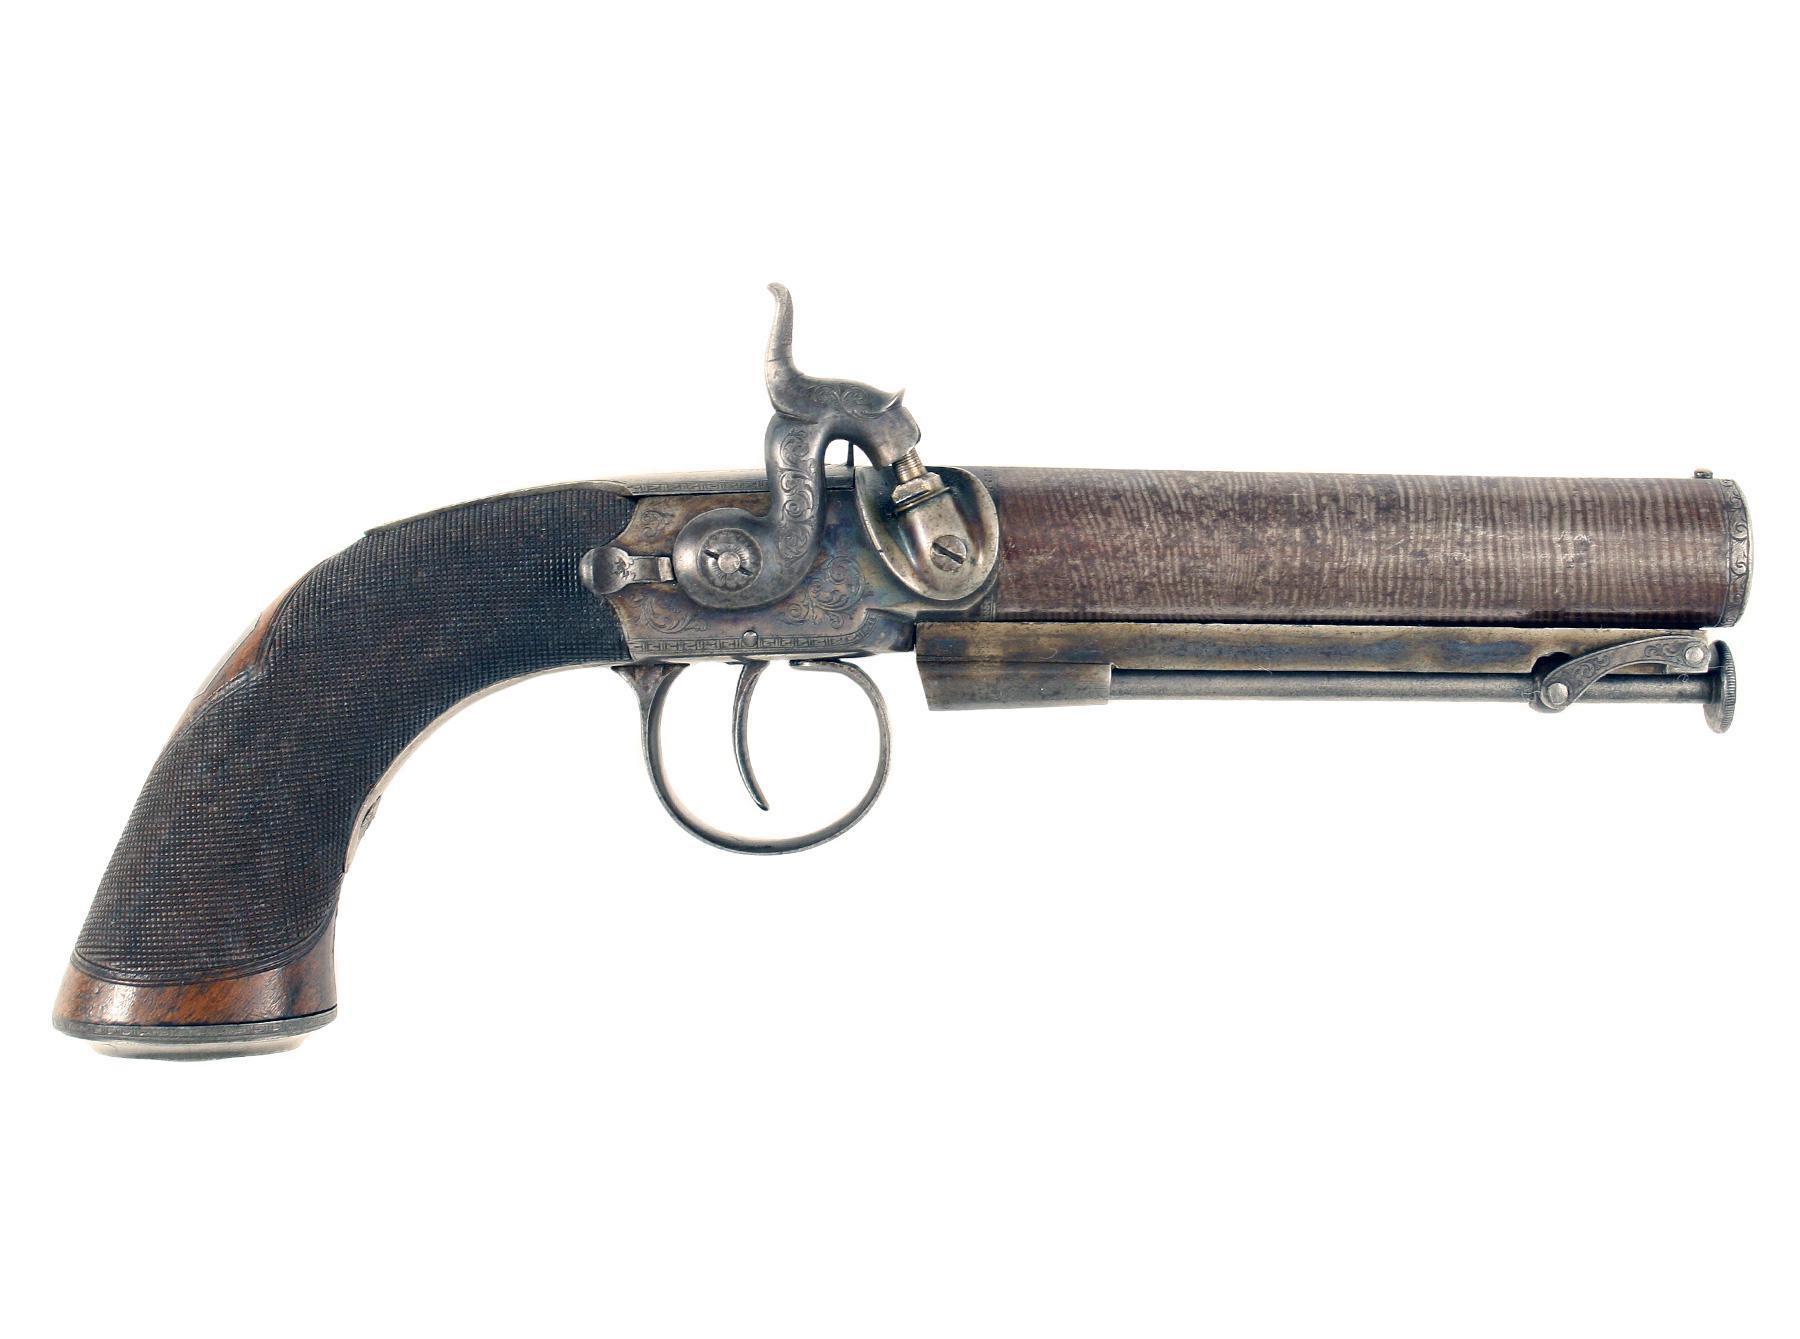 A Crisp PercussionBelt Pistol by Gibbs of Bristol